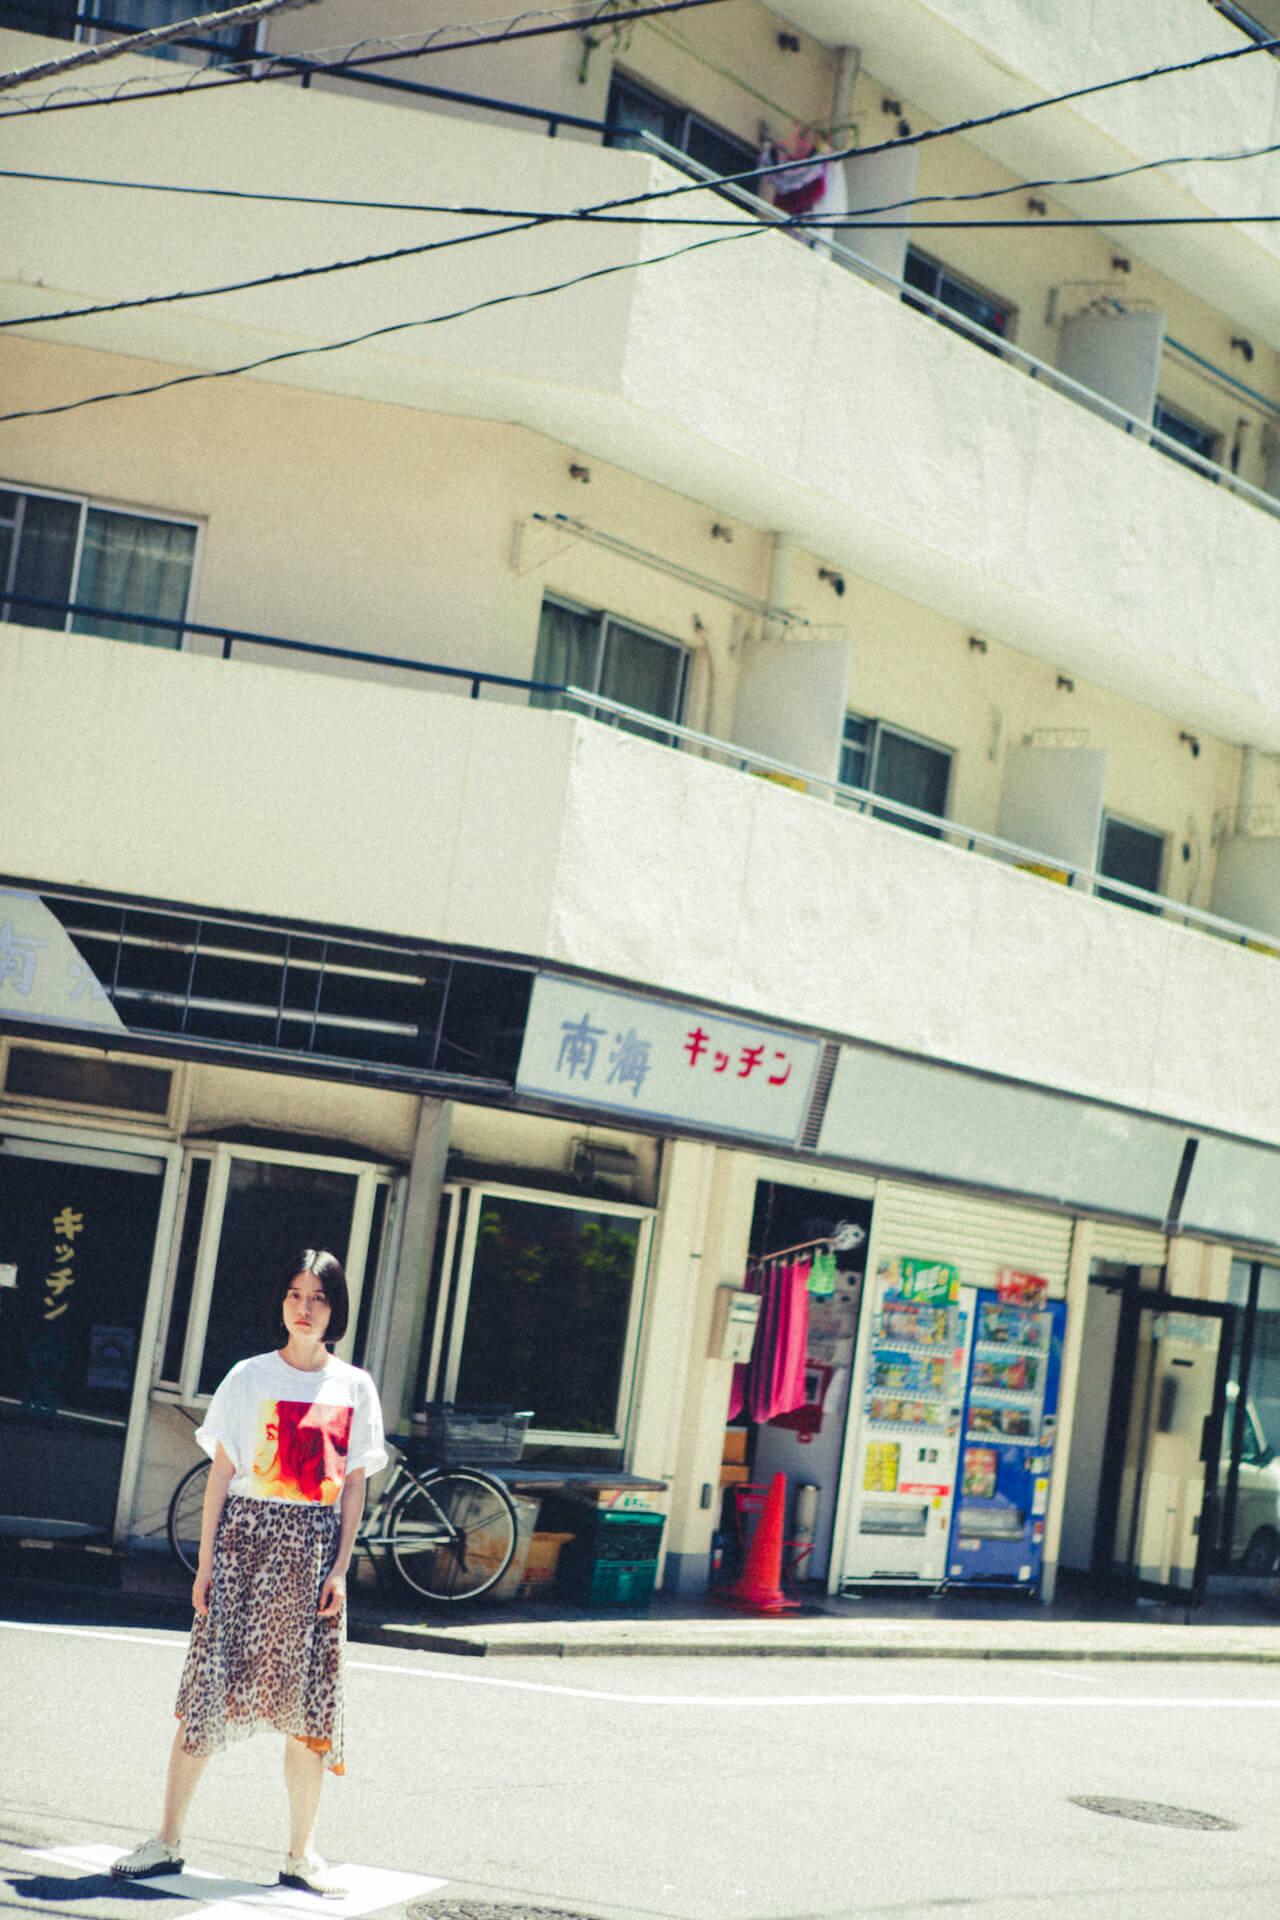 UA × Journal StandardのコラボTシャツが6月25日より店舗販売開始|美衣がモデルを務めるビジュアルも公開に life_fashion210611-ua-journalstandard-8